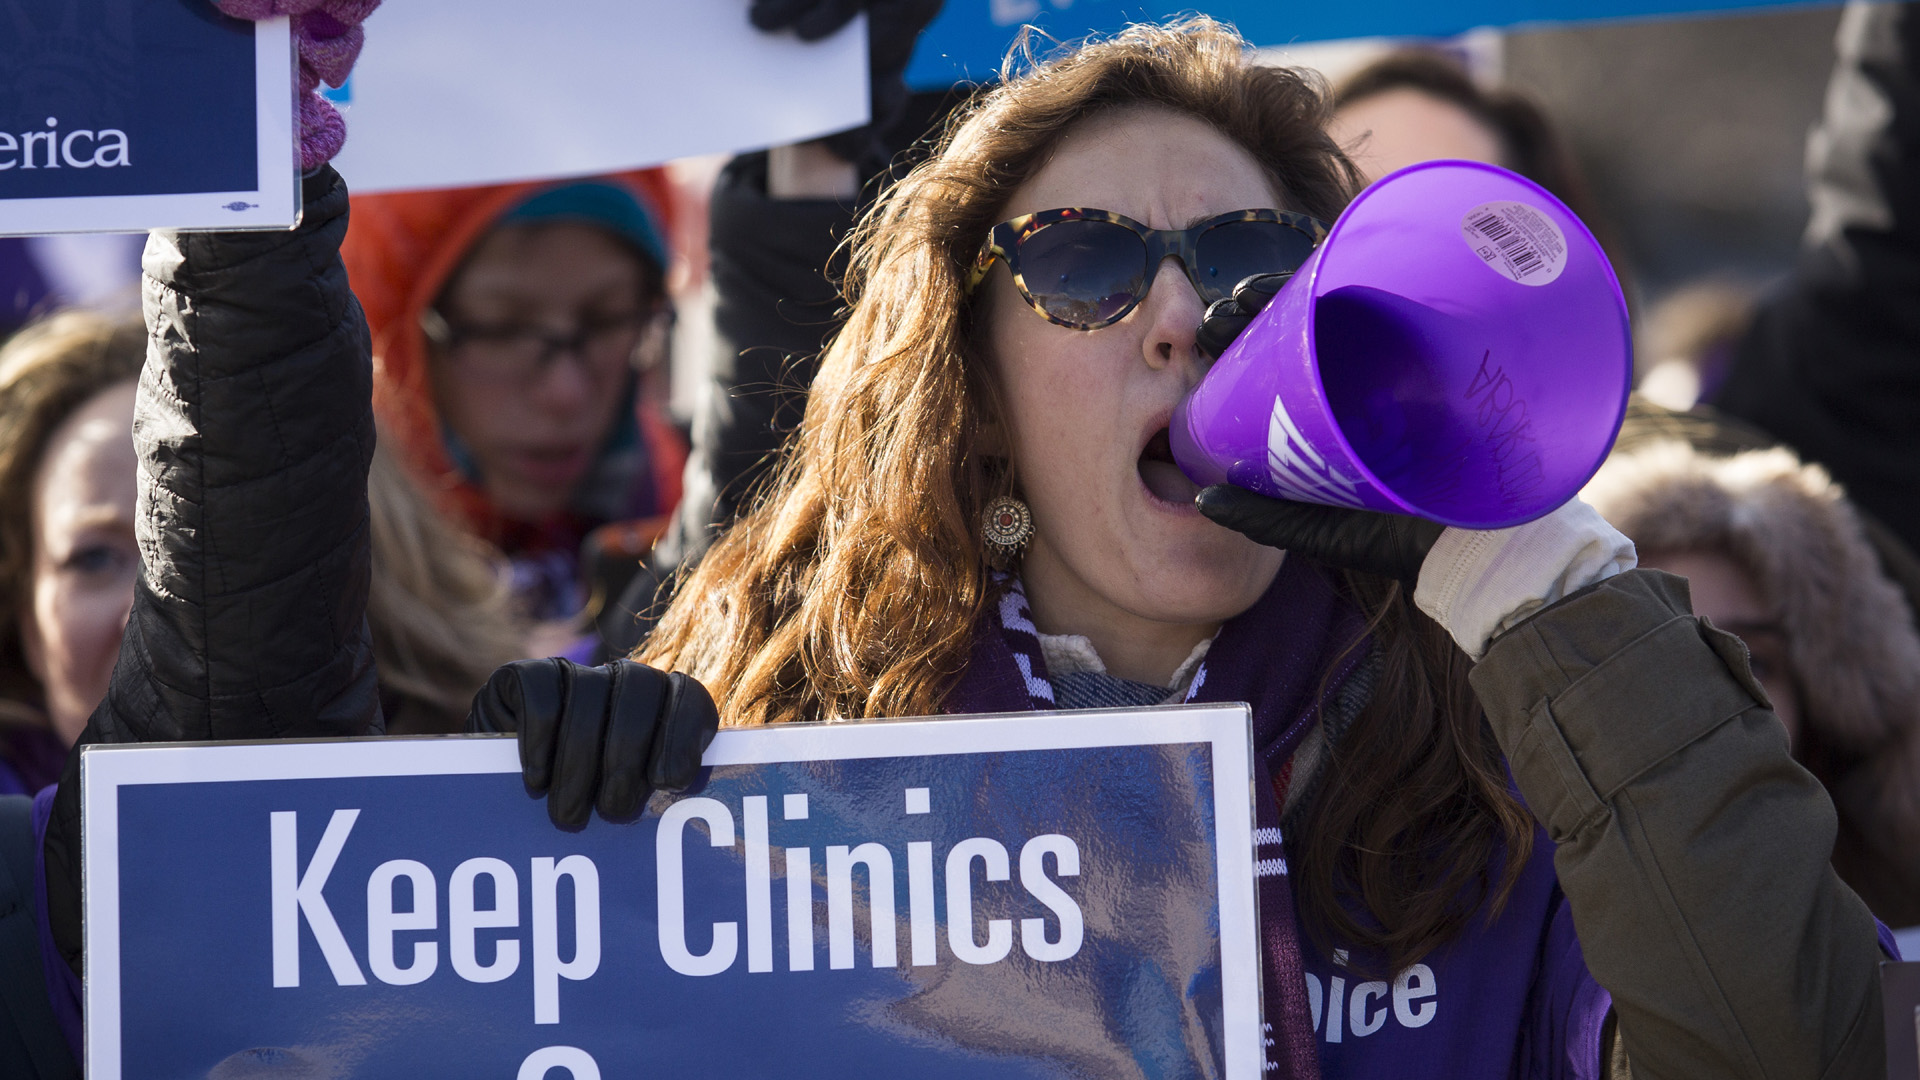 DC rally abortion pro-life04268500-159532